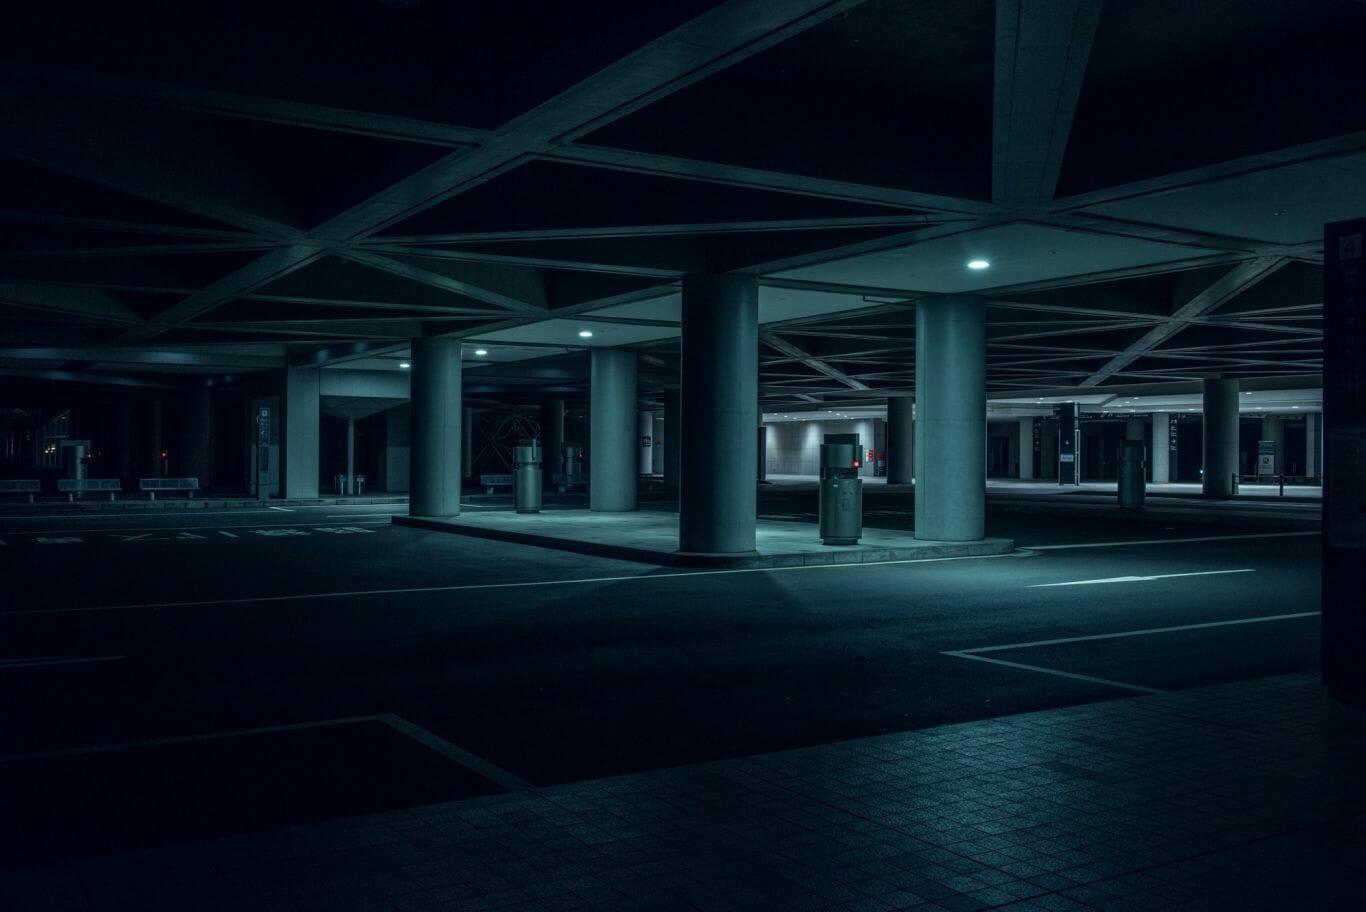 Tóquio Blade Runner 5